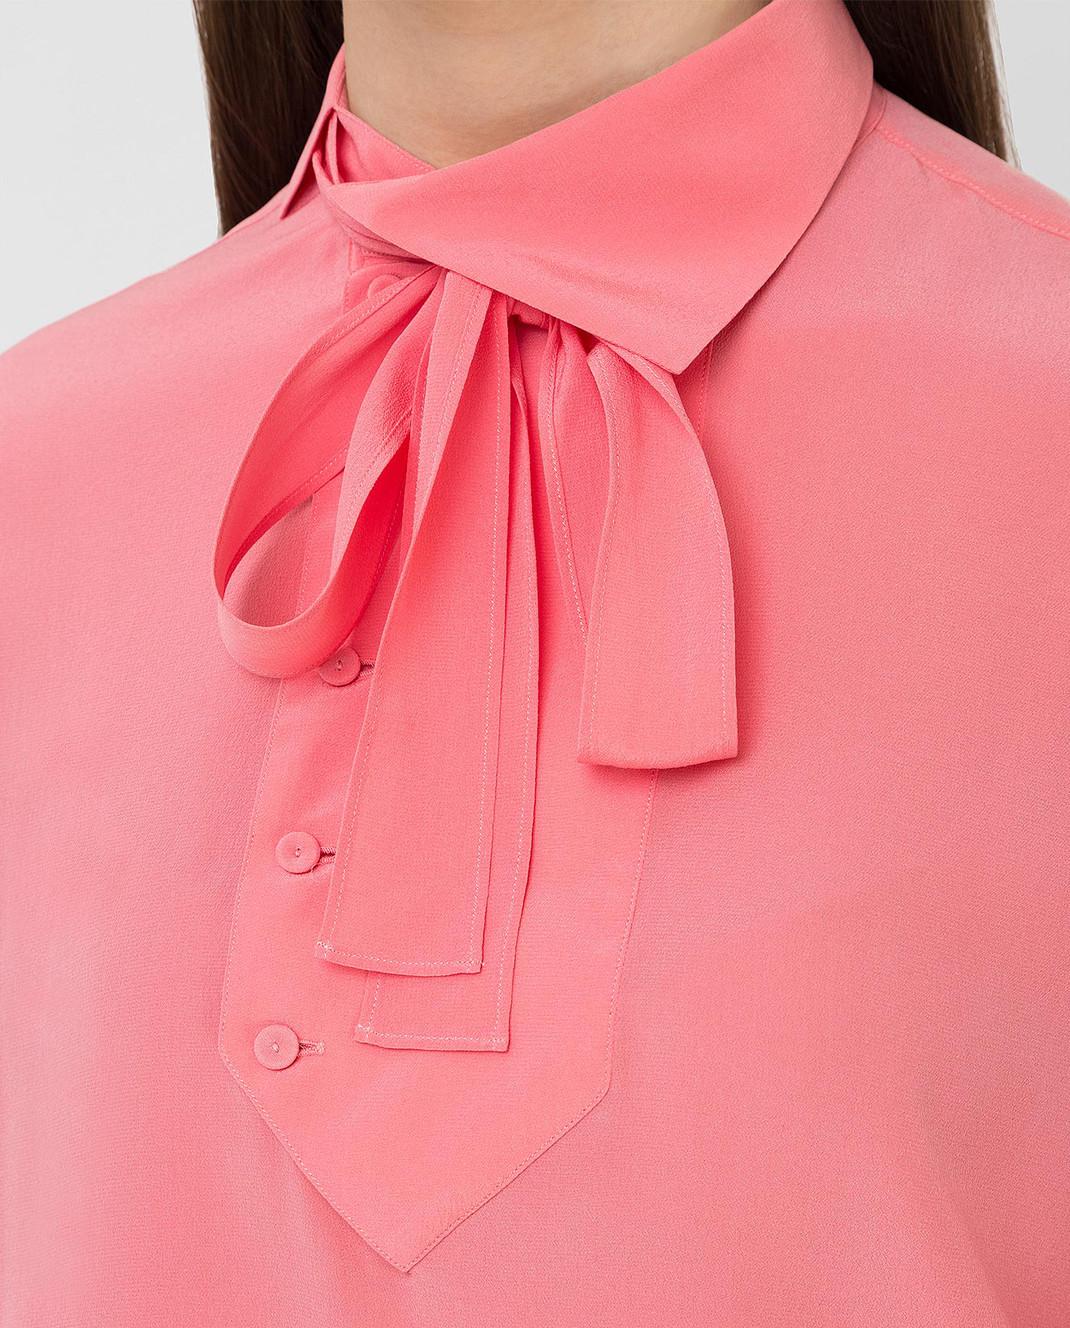 Valentino Коралловая блуза из шелка MB0AB08F21B изображение 5